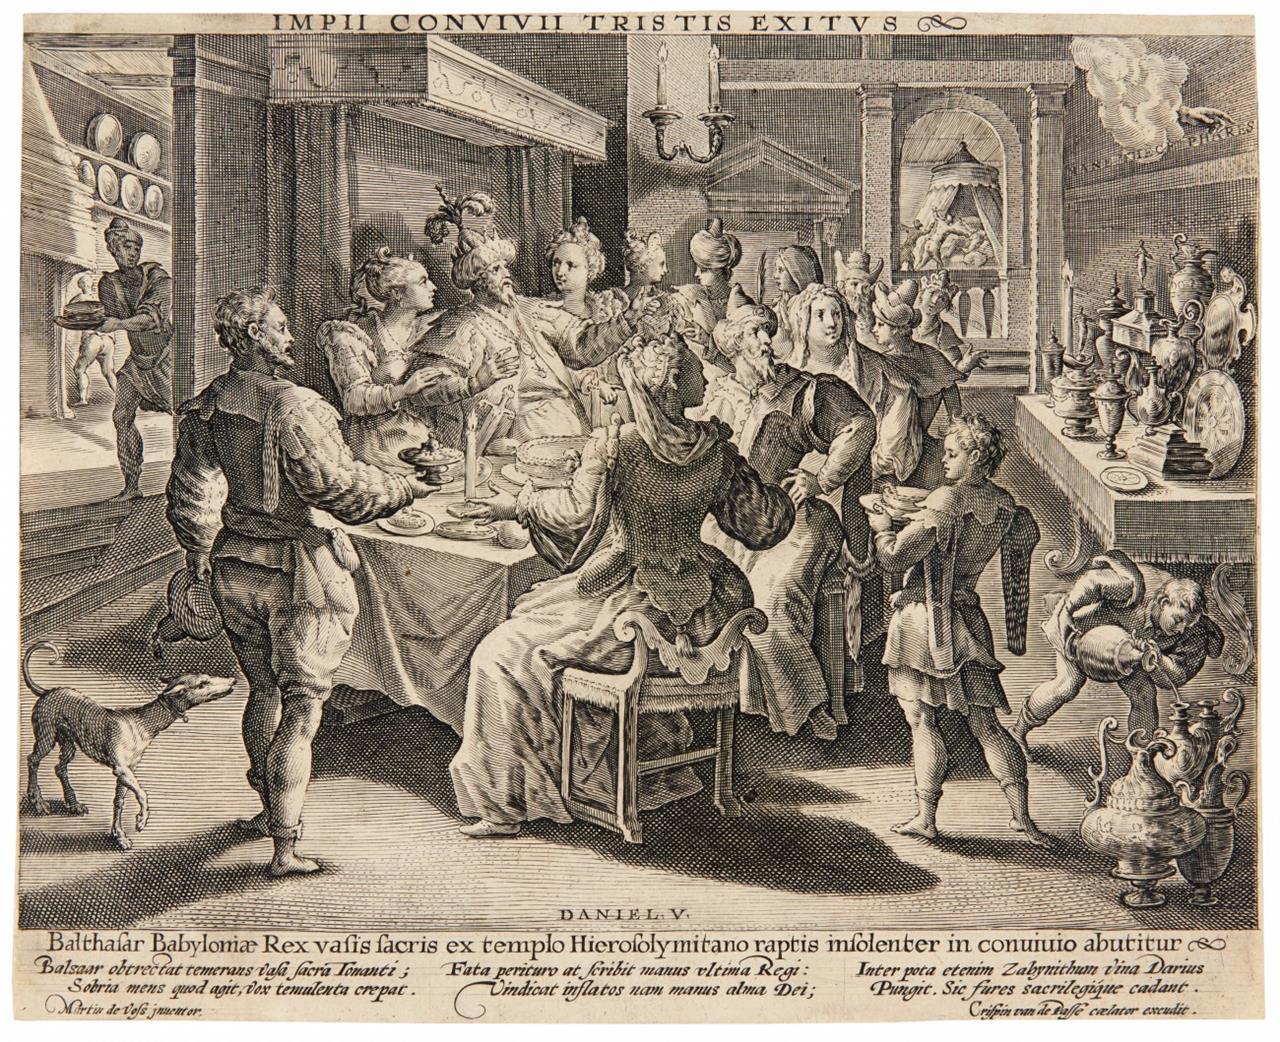 Maarten de Vos. Das Festmahl des Belsazar. Kupferstich von Crispijn de Passe.